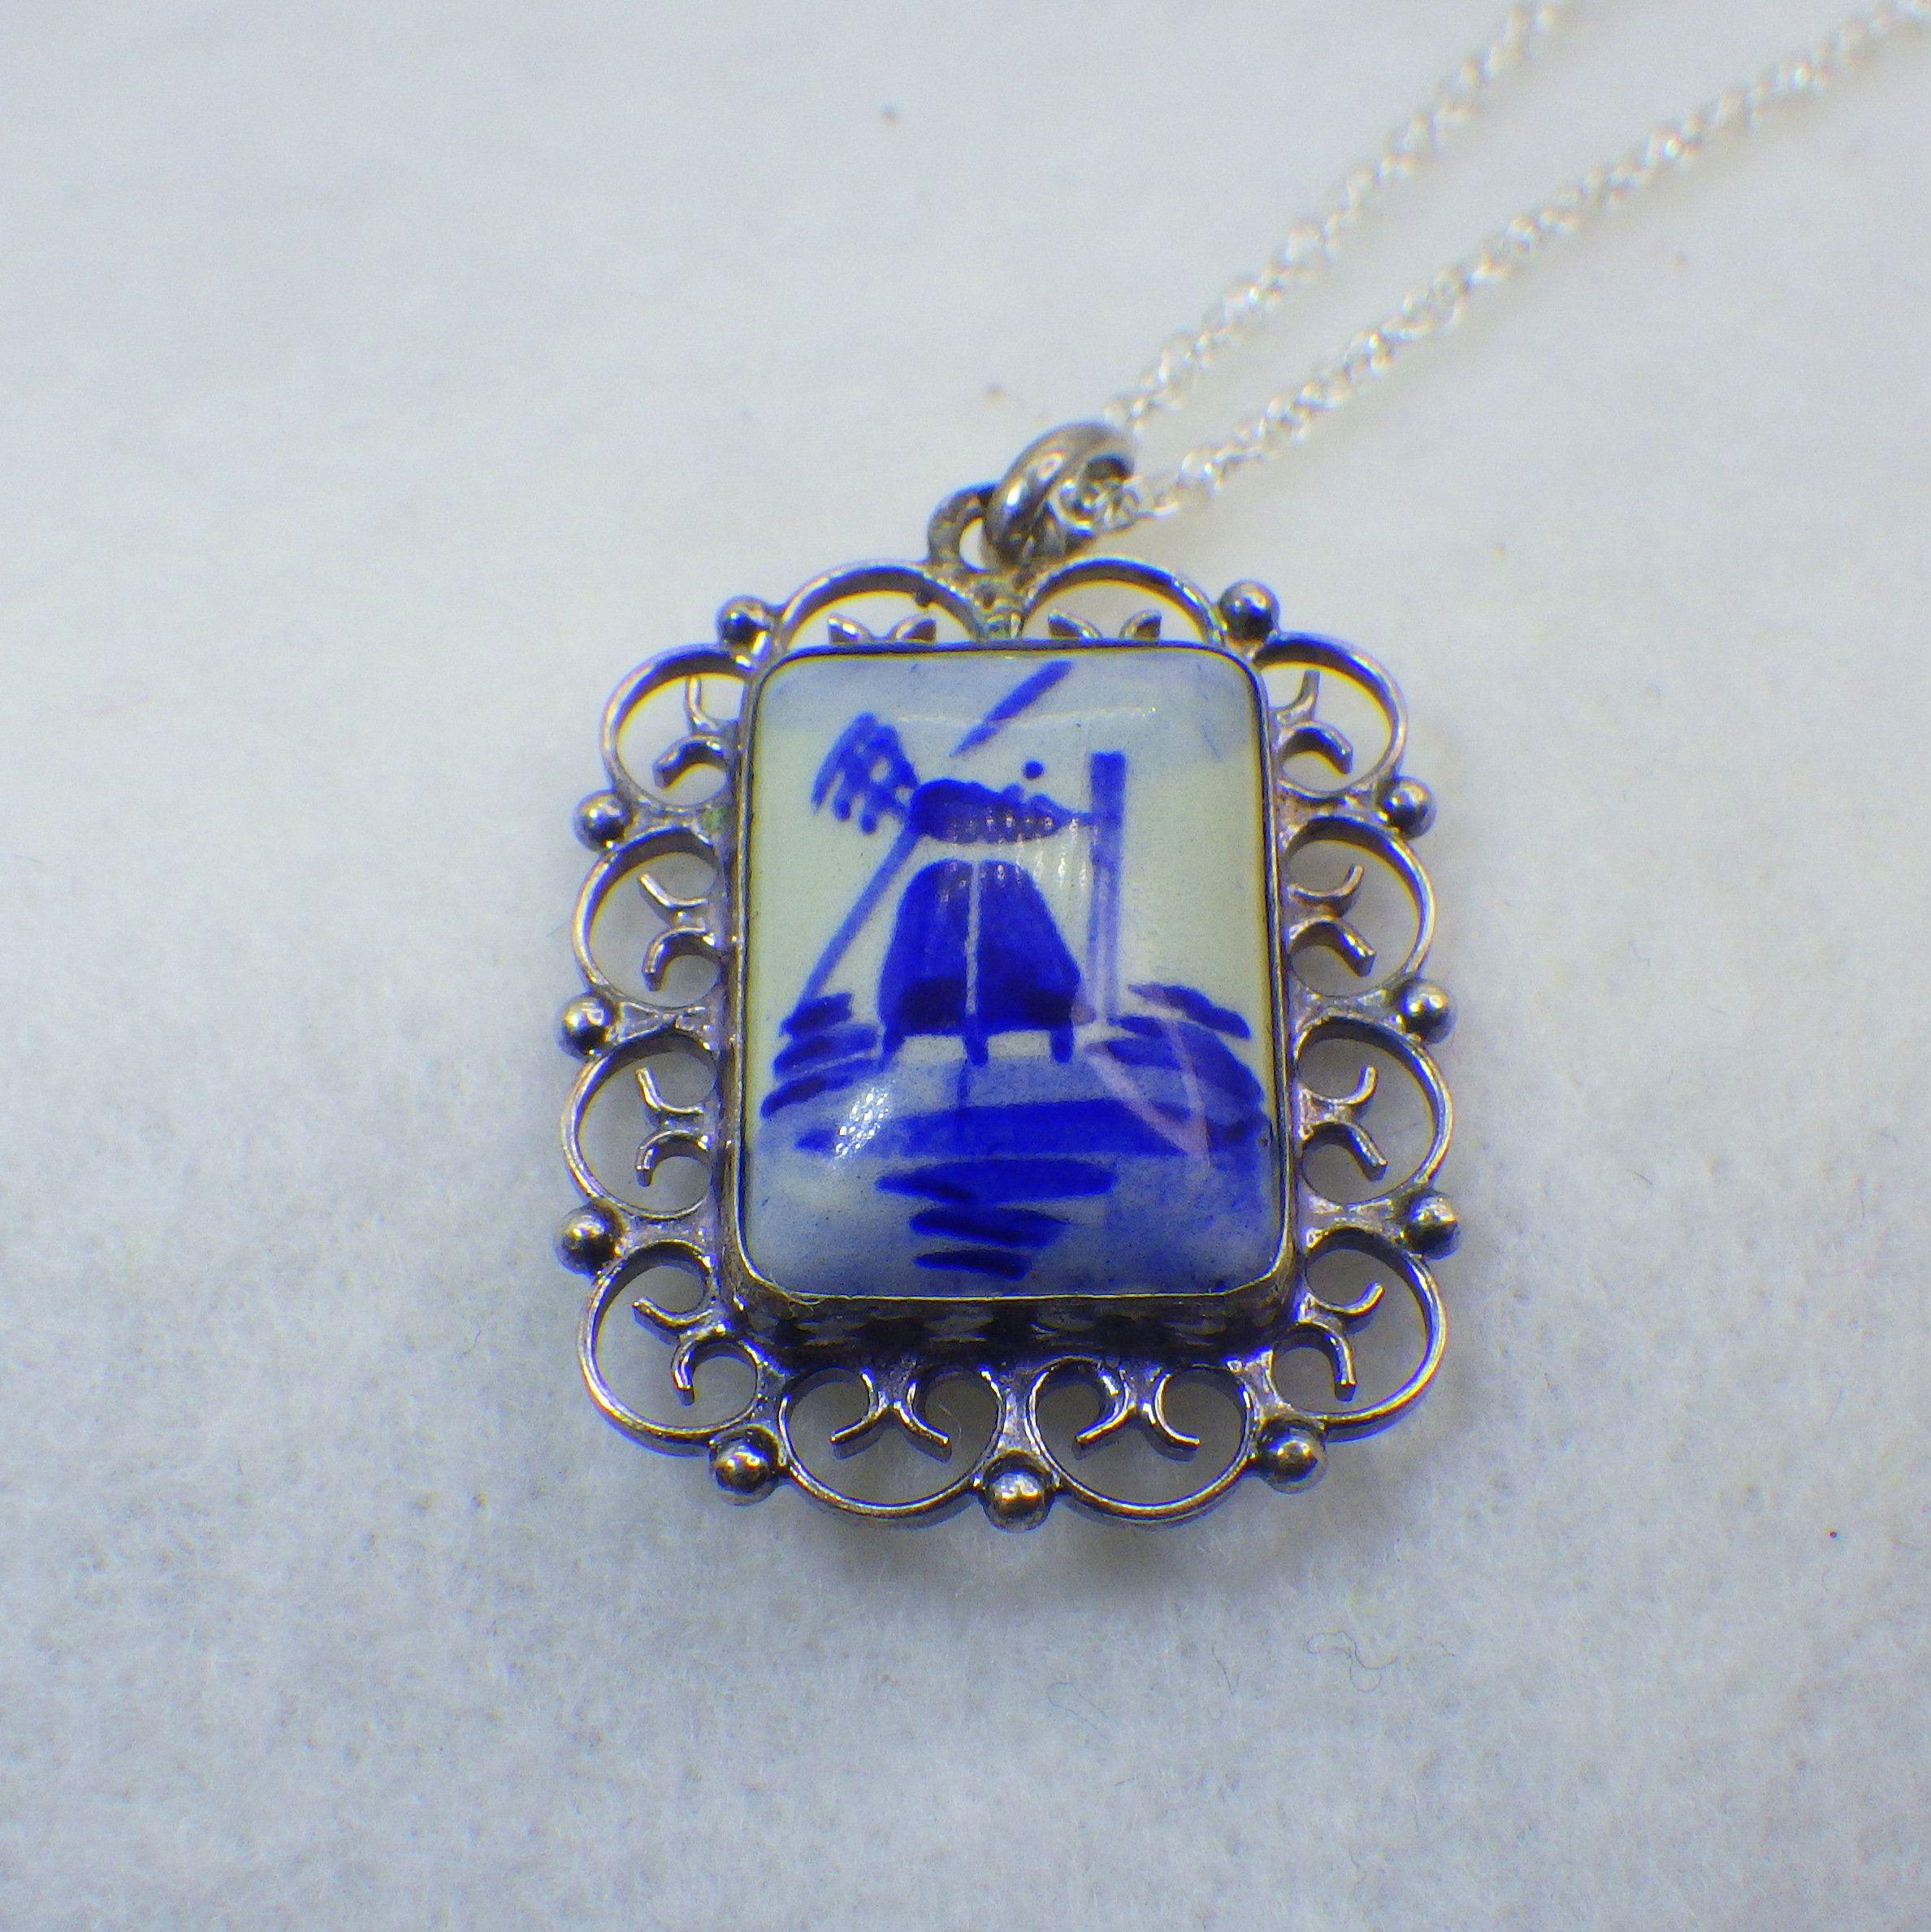 True Delft Porcelain Pendant Necklace Sterling Silver